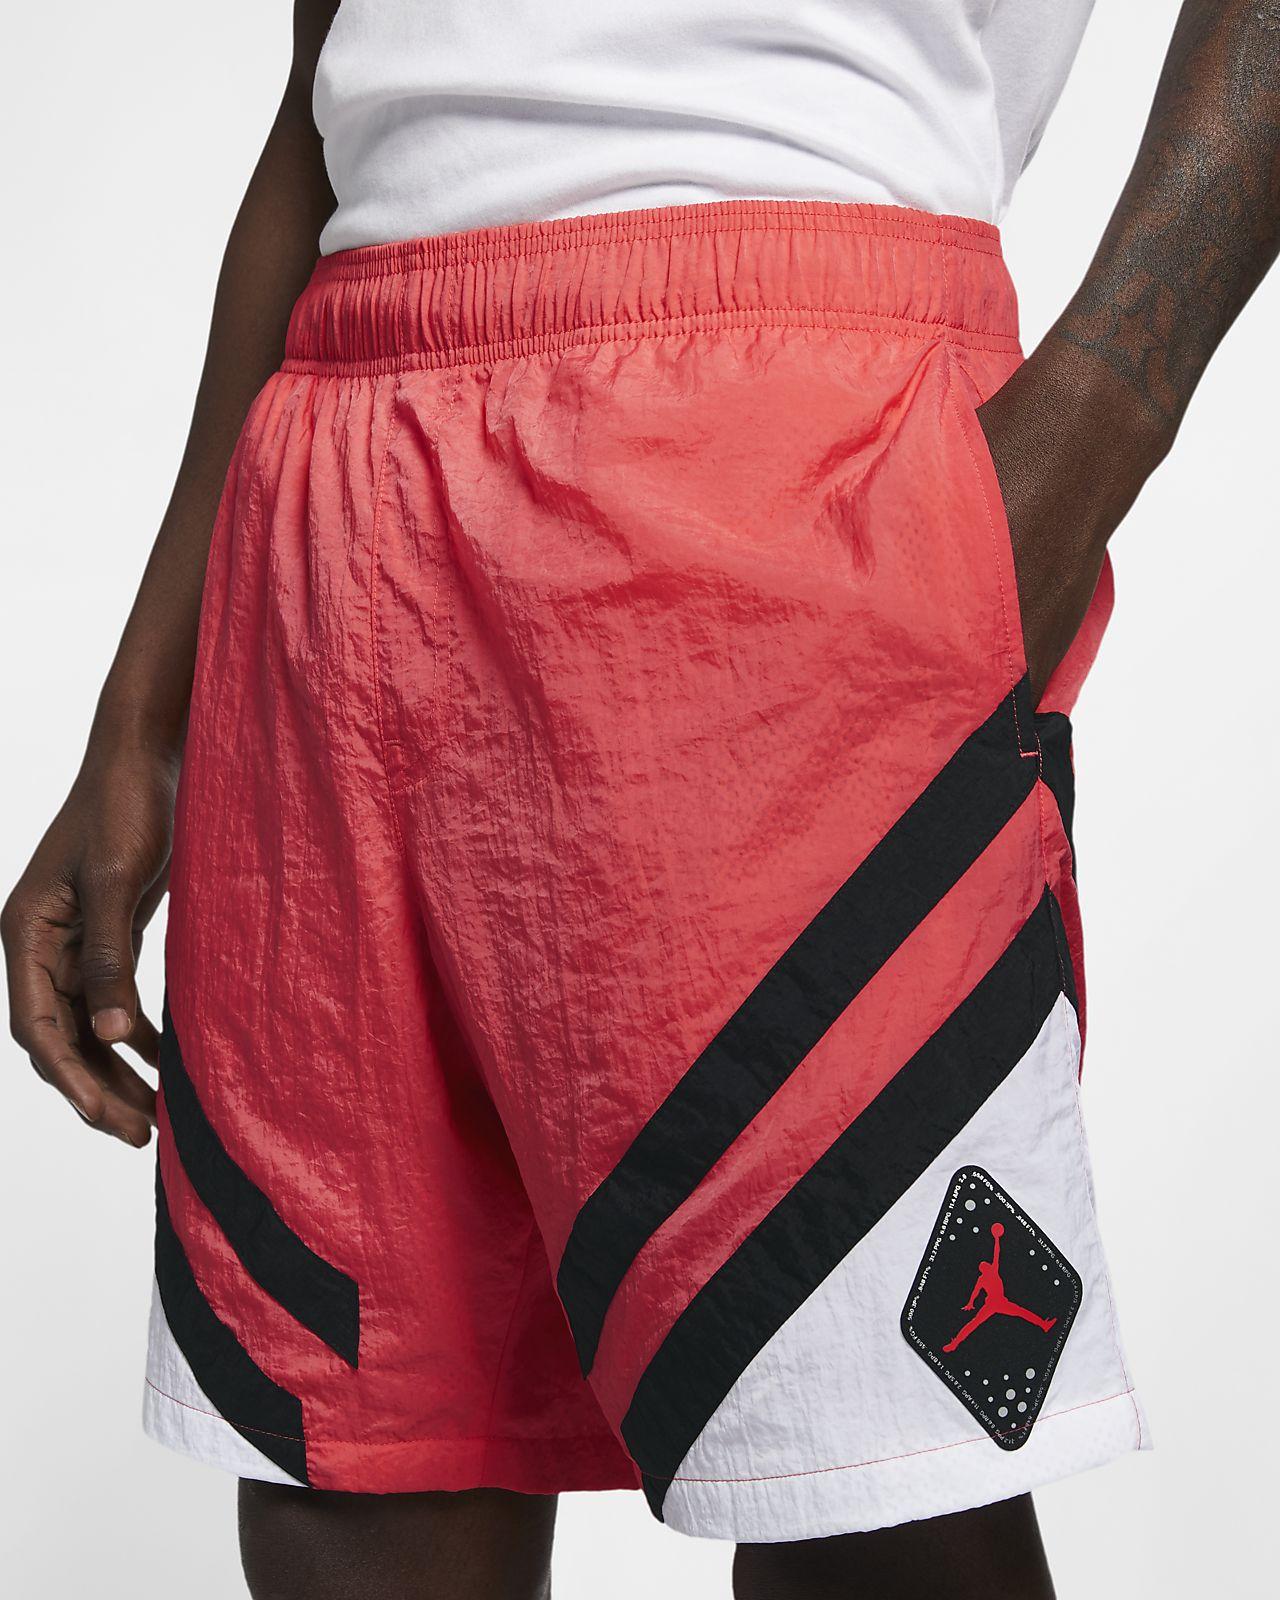 ca295c40b9db Jordan Legacy AJ 6 Men s Nylon Shorts. Nike.com CA